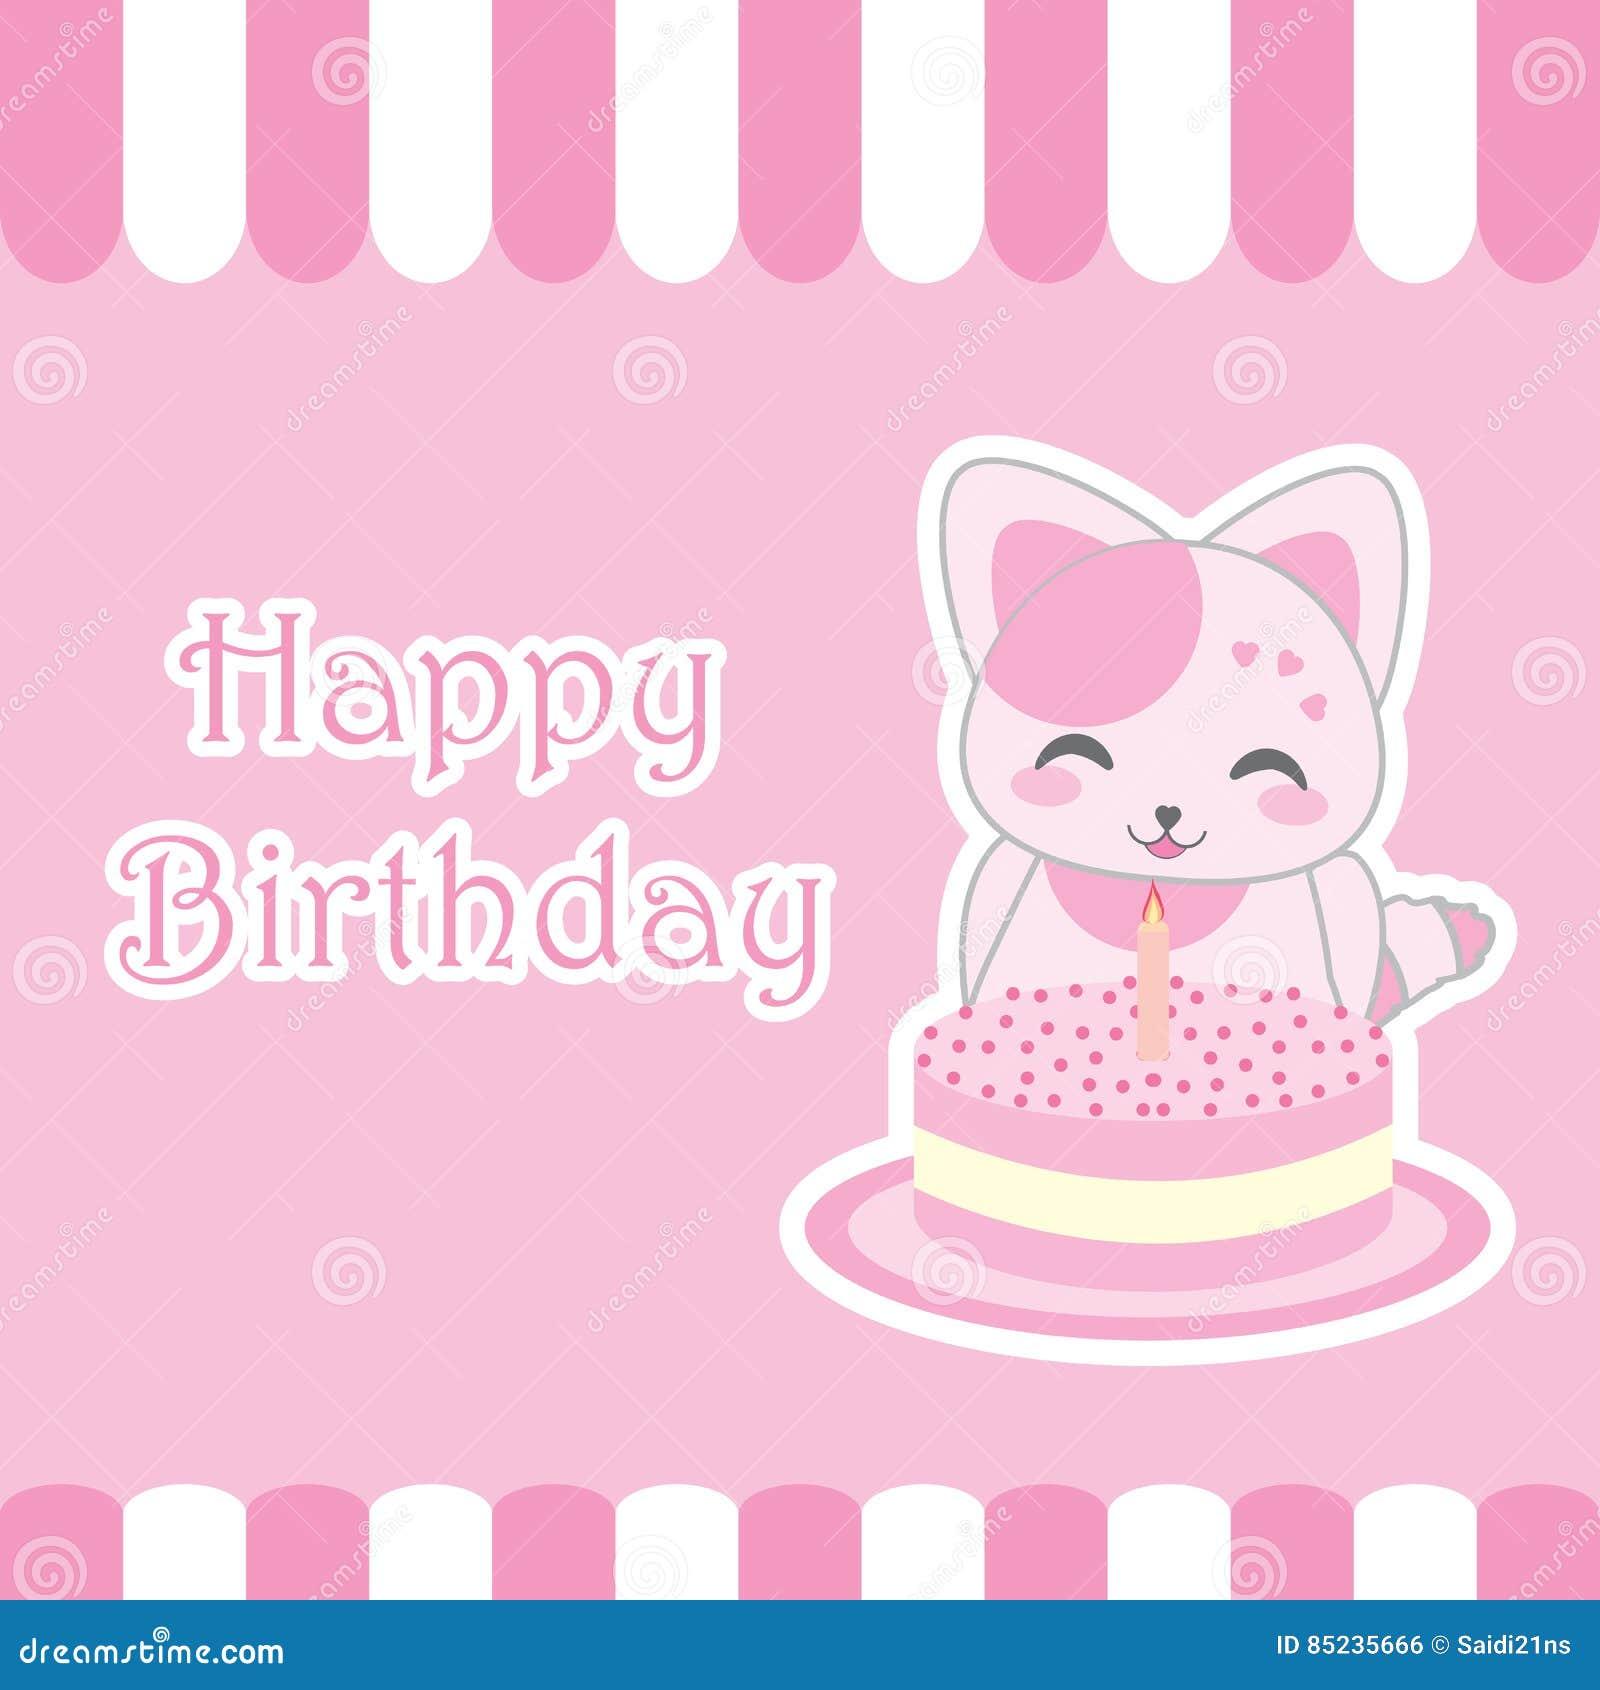 birthday card with cute cat and birthday cake vector cartoon